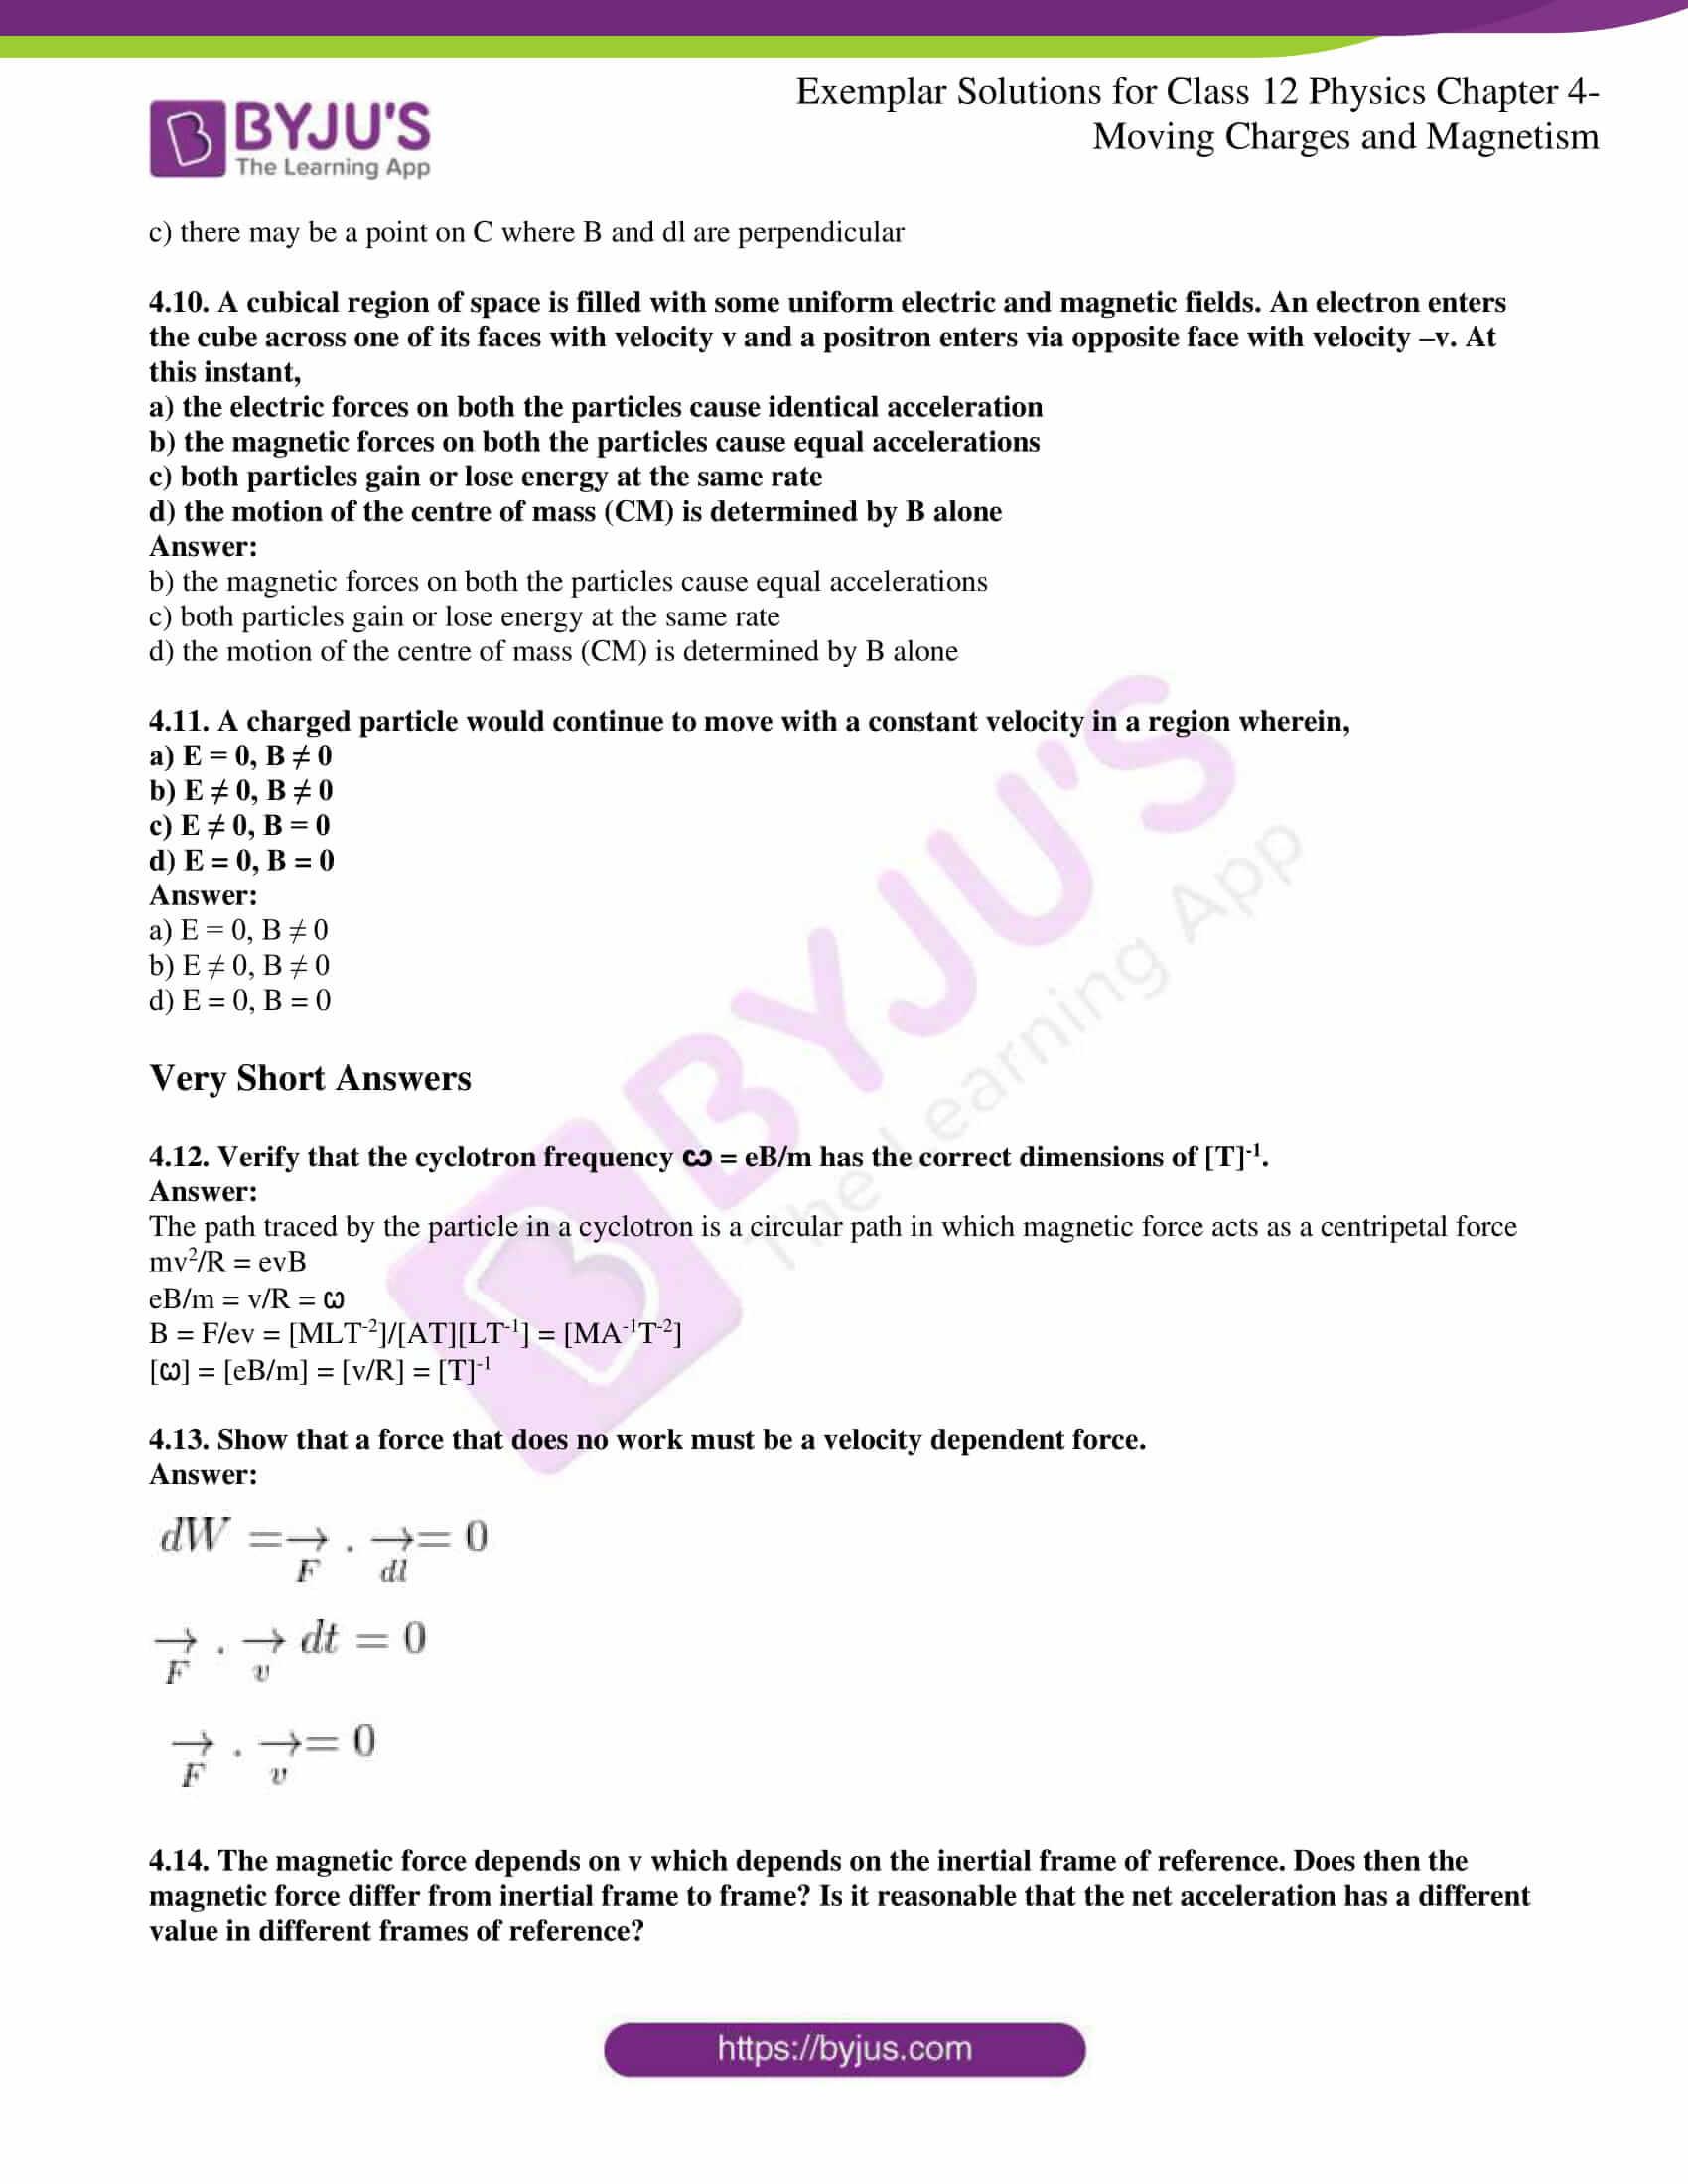 ncert exemplar solutions for class 12 physics chapter 4 03